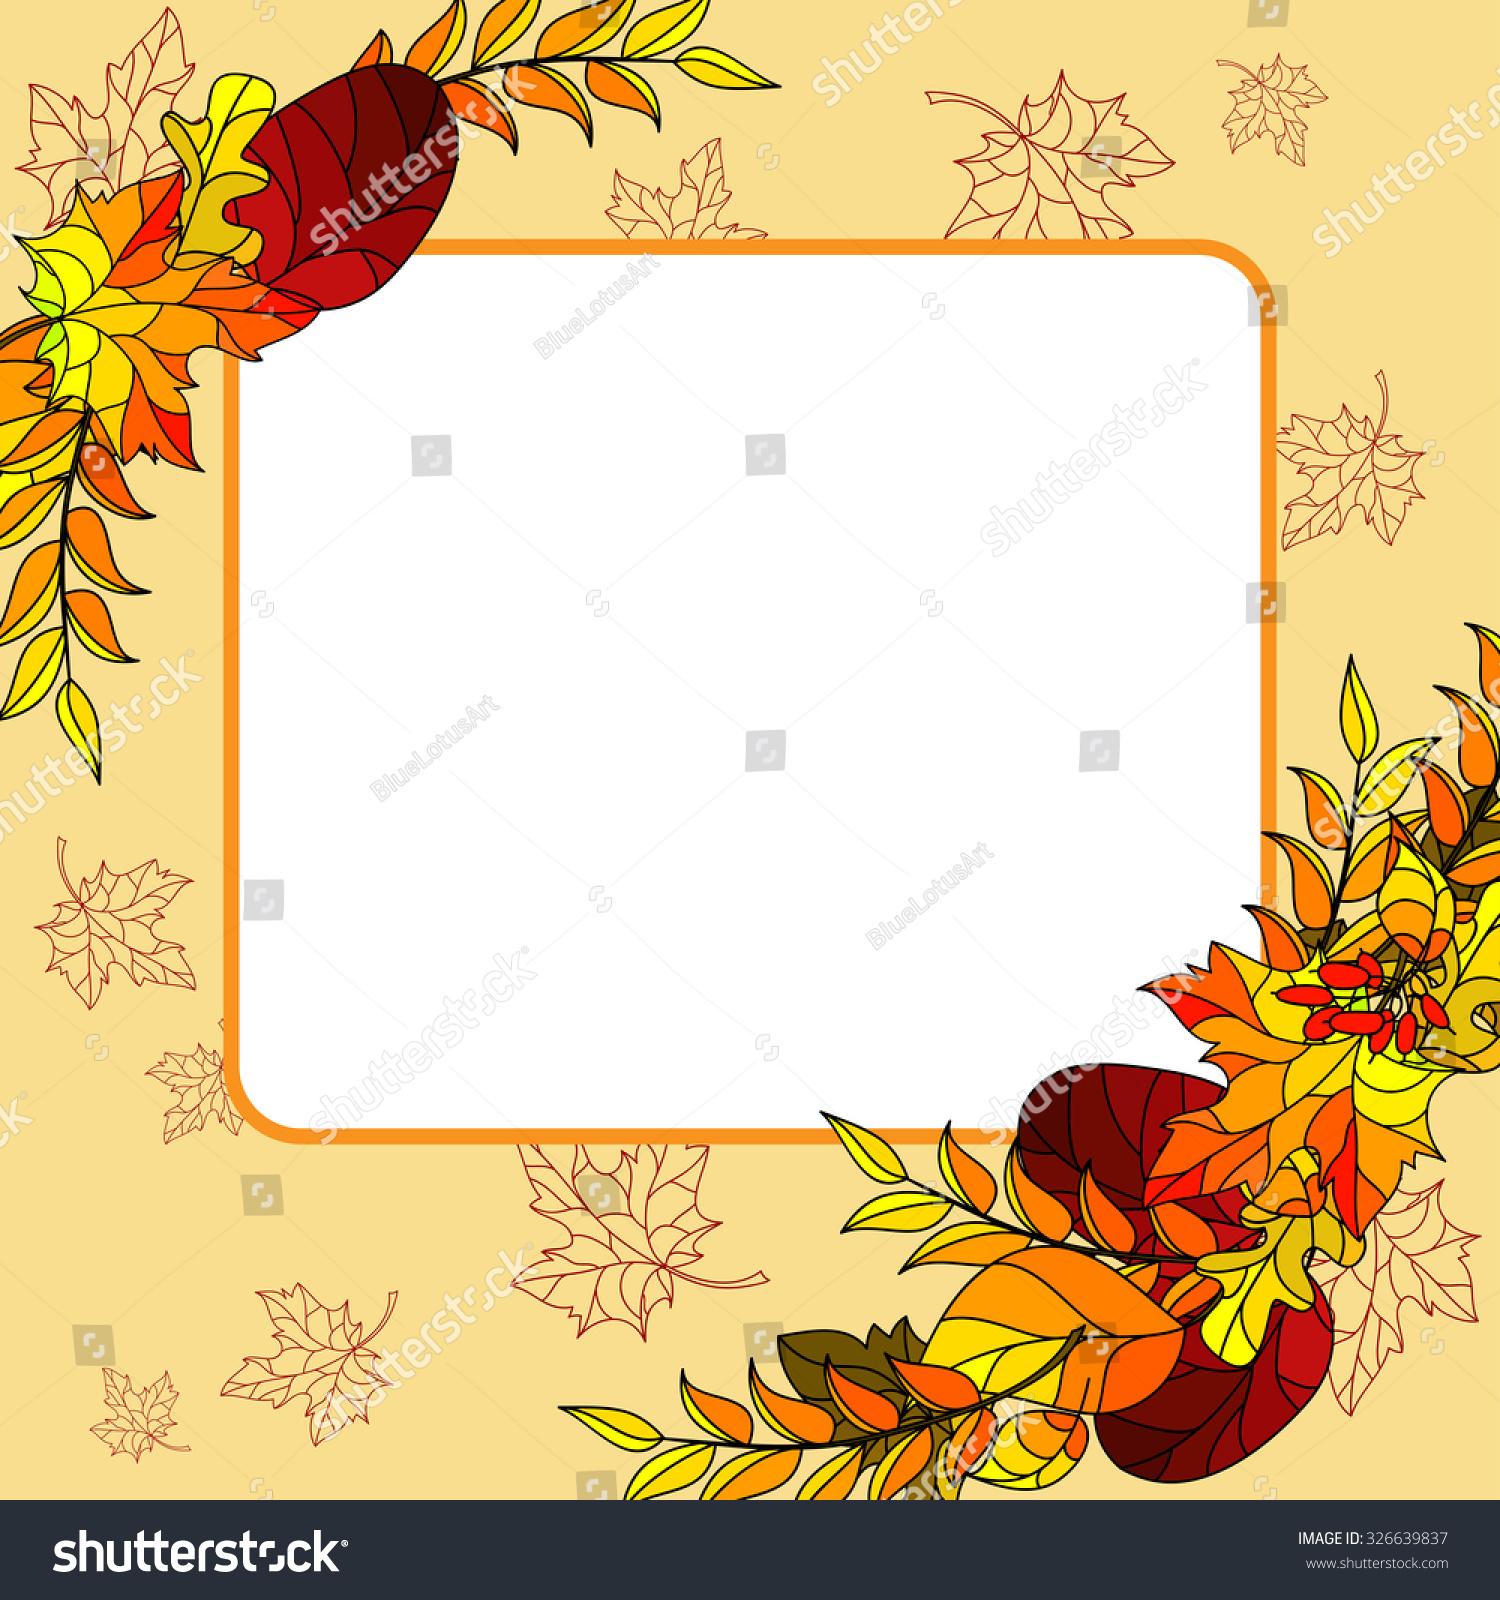 Invitation Greeting Card Template Autumn Leaves Vector – Greeting Card Template